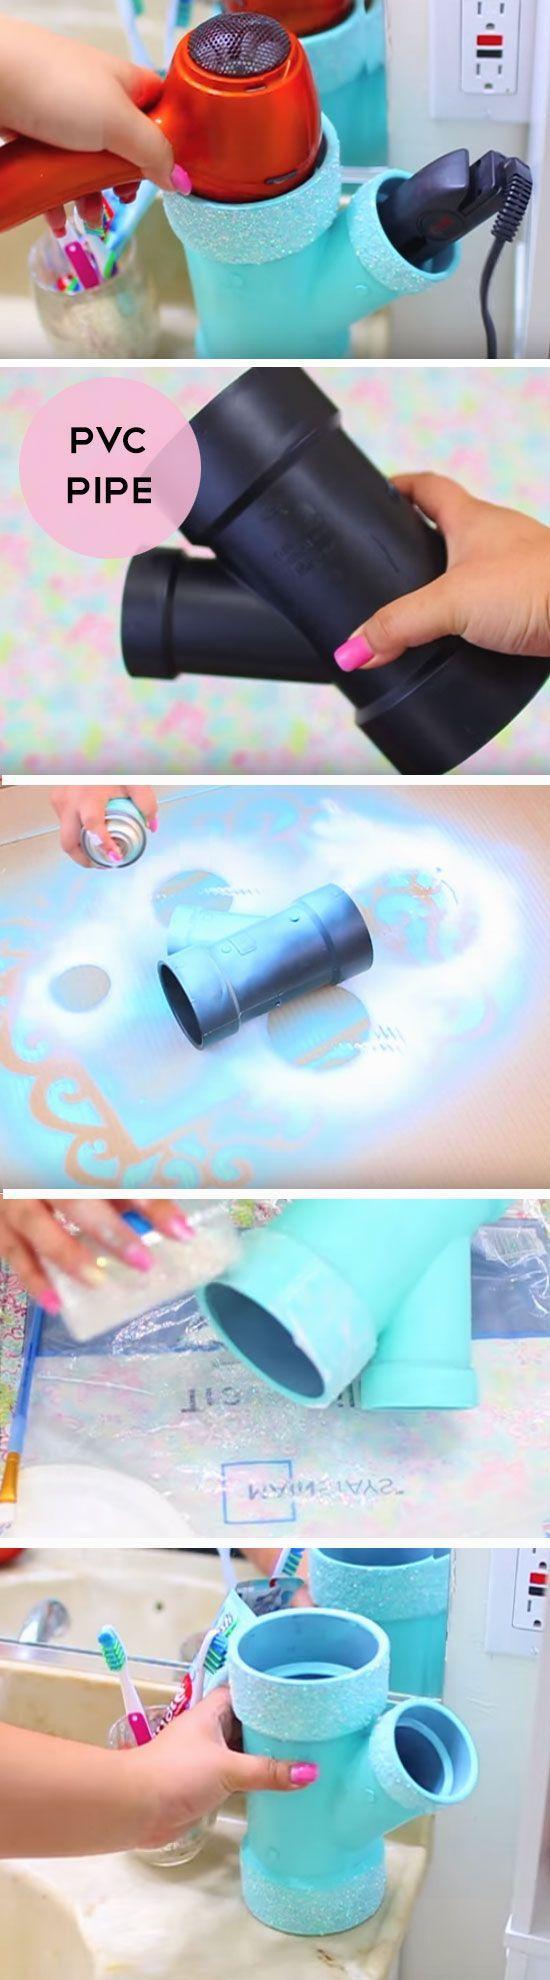 35+ coole DIY-Projekte mit PVC Rohr #cleaningandtools